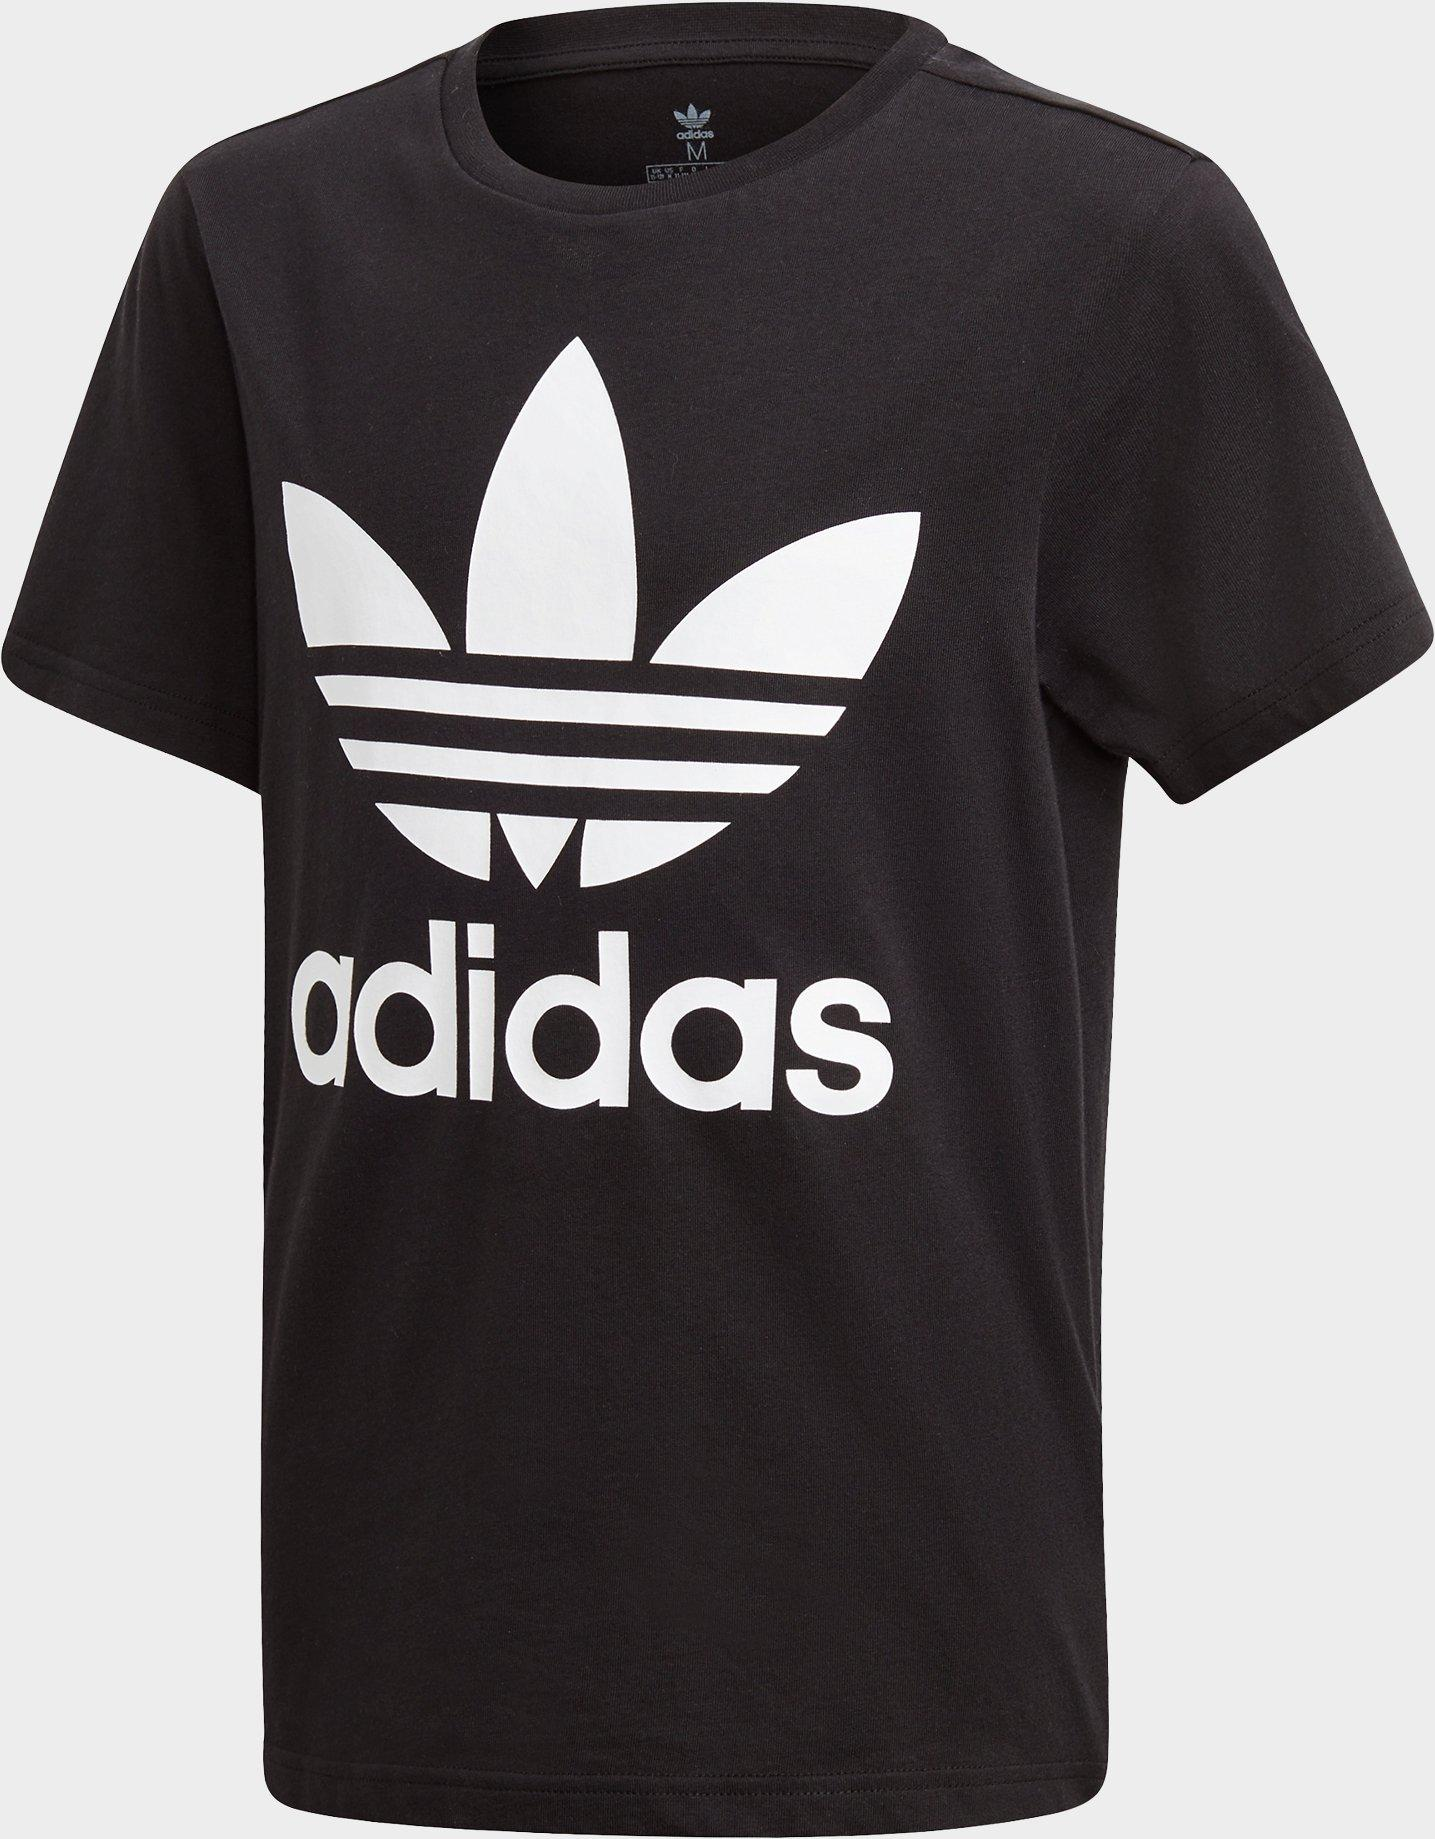 adidas originals trefoil t shirt